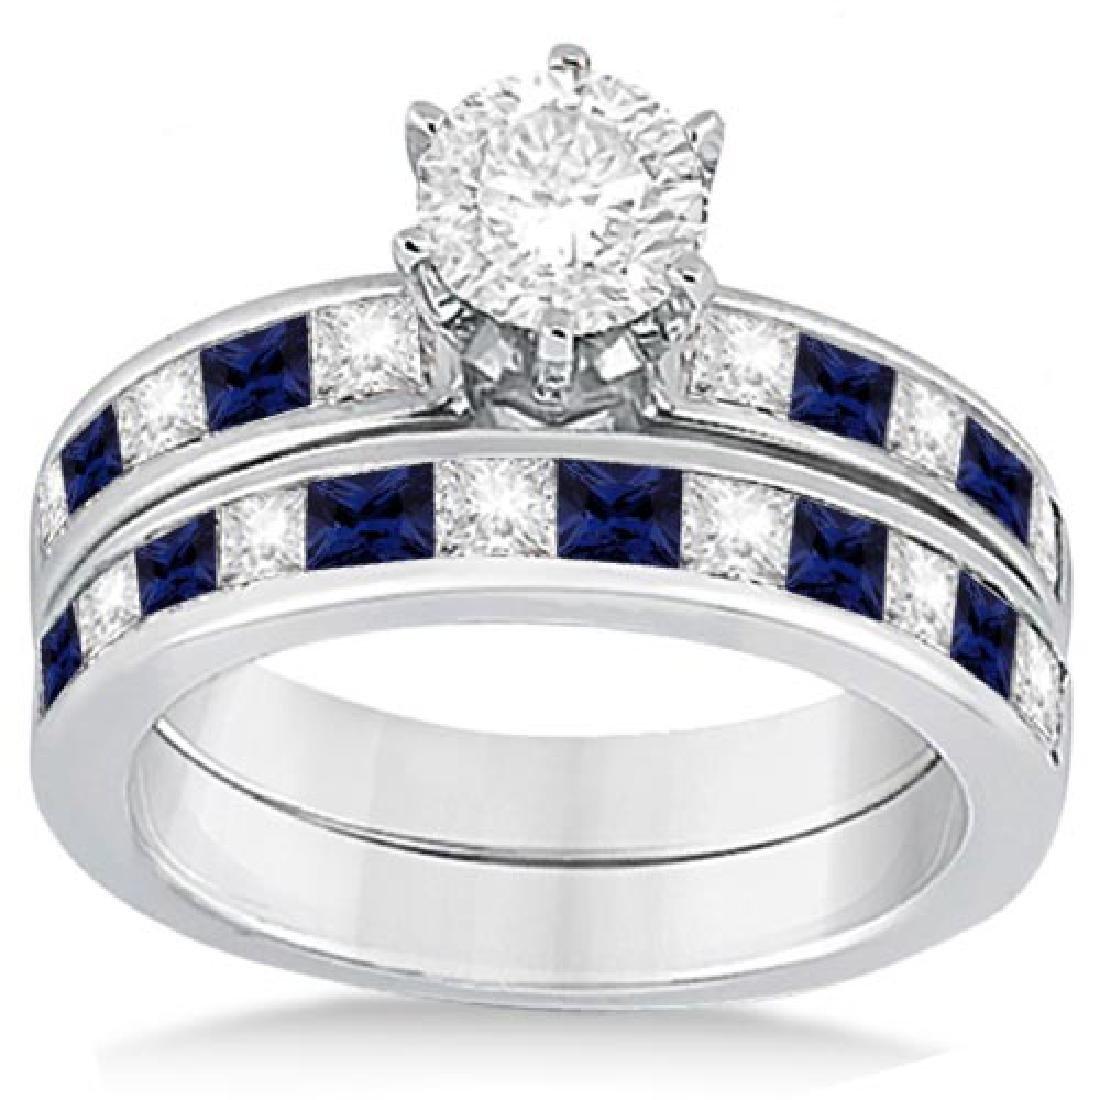 Channel Blue Sapphire and Diamond Bridal Set 14k White